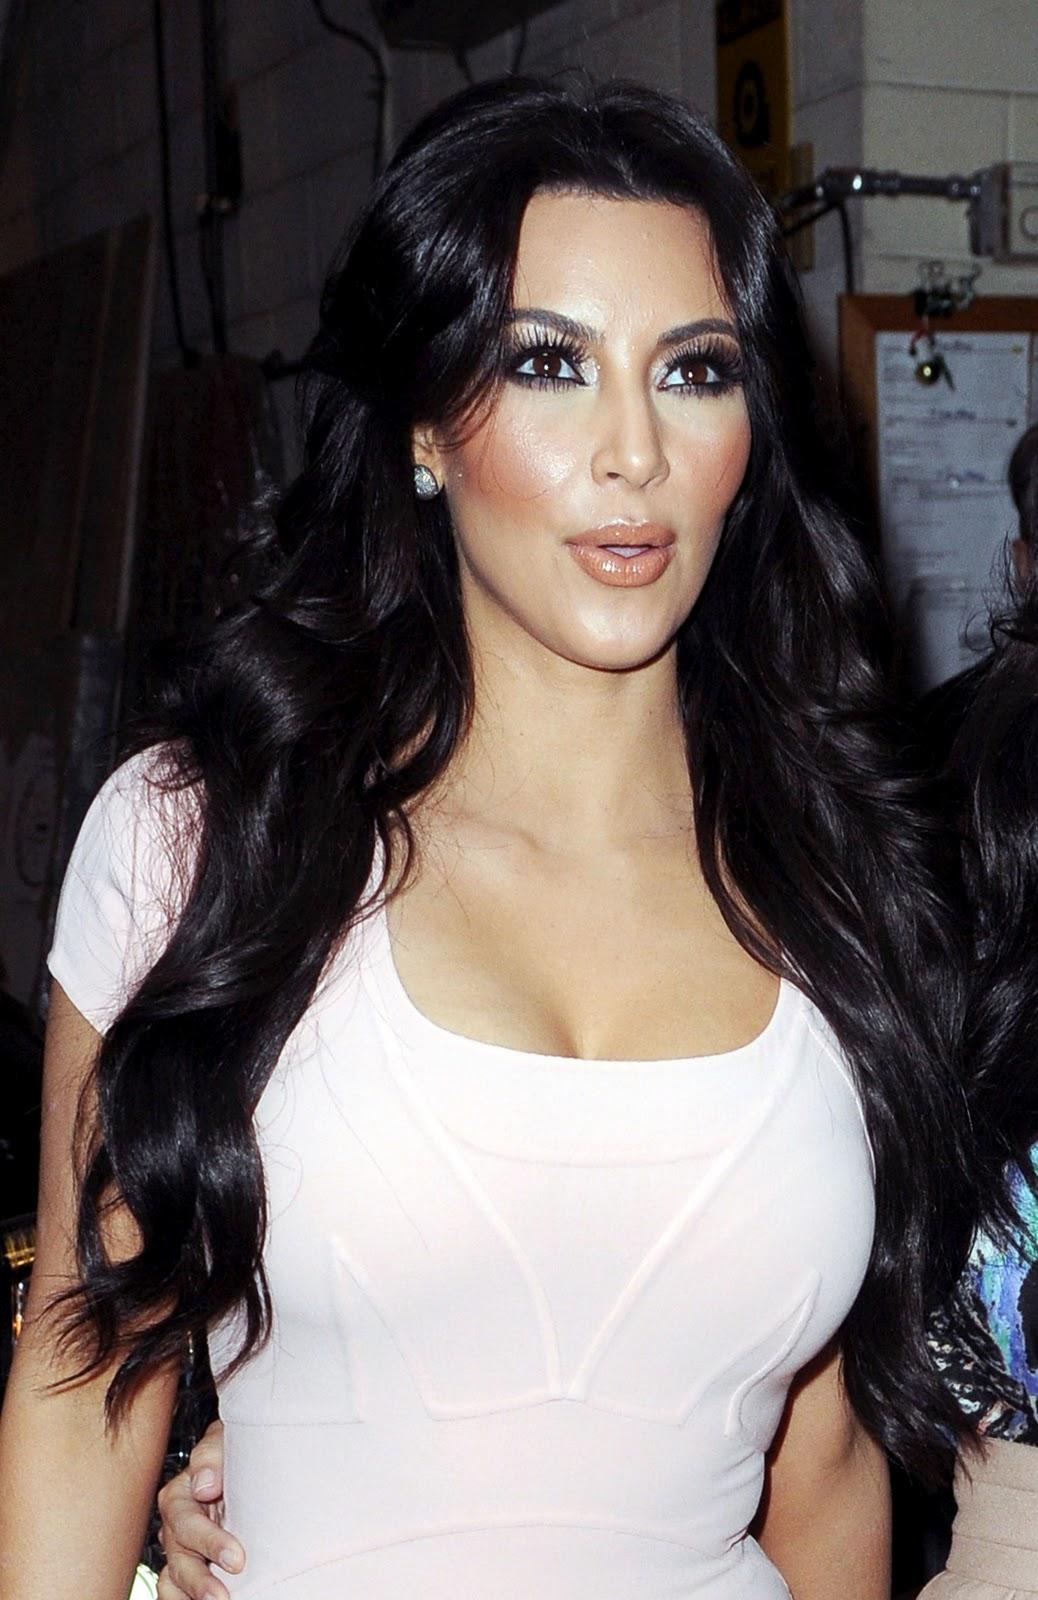 http://4.bp.blogspot.com/_qSI1URO4afE/TThzfzBHX7I/AAAAAAAAHwQ/8R0rOtZEvmM/s1600/Kim-Kardashian-217.jpg